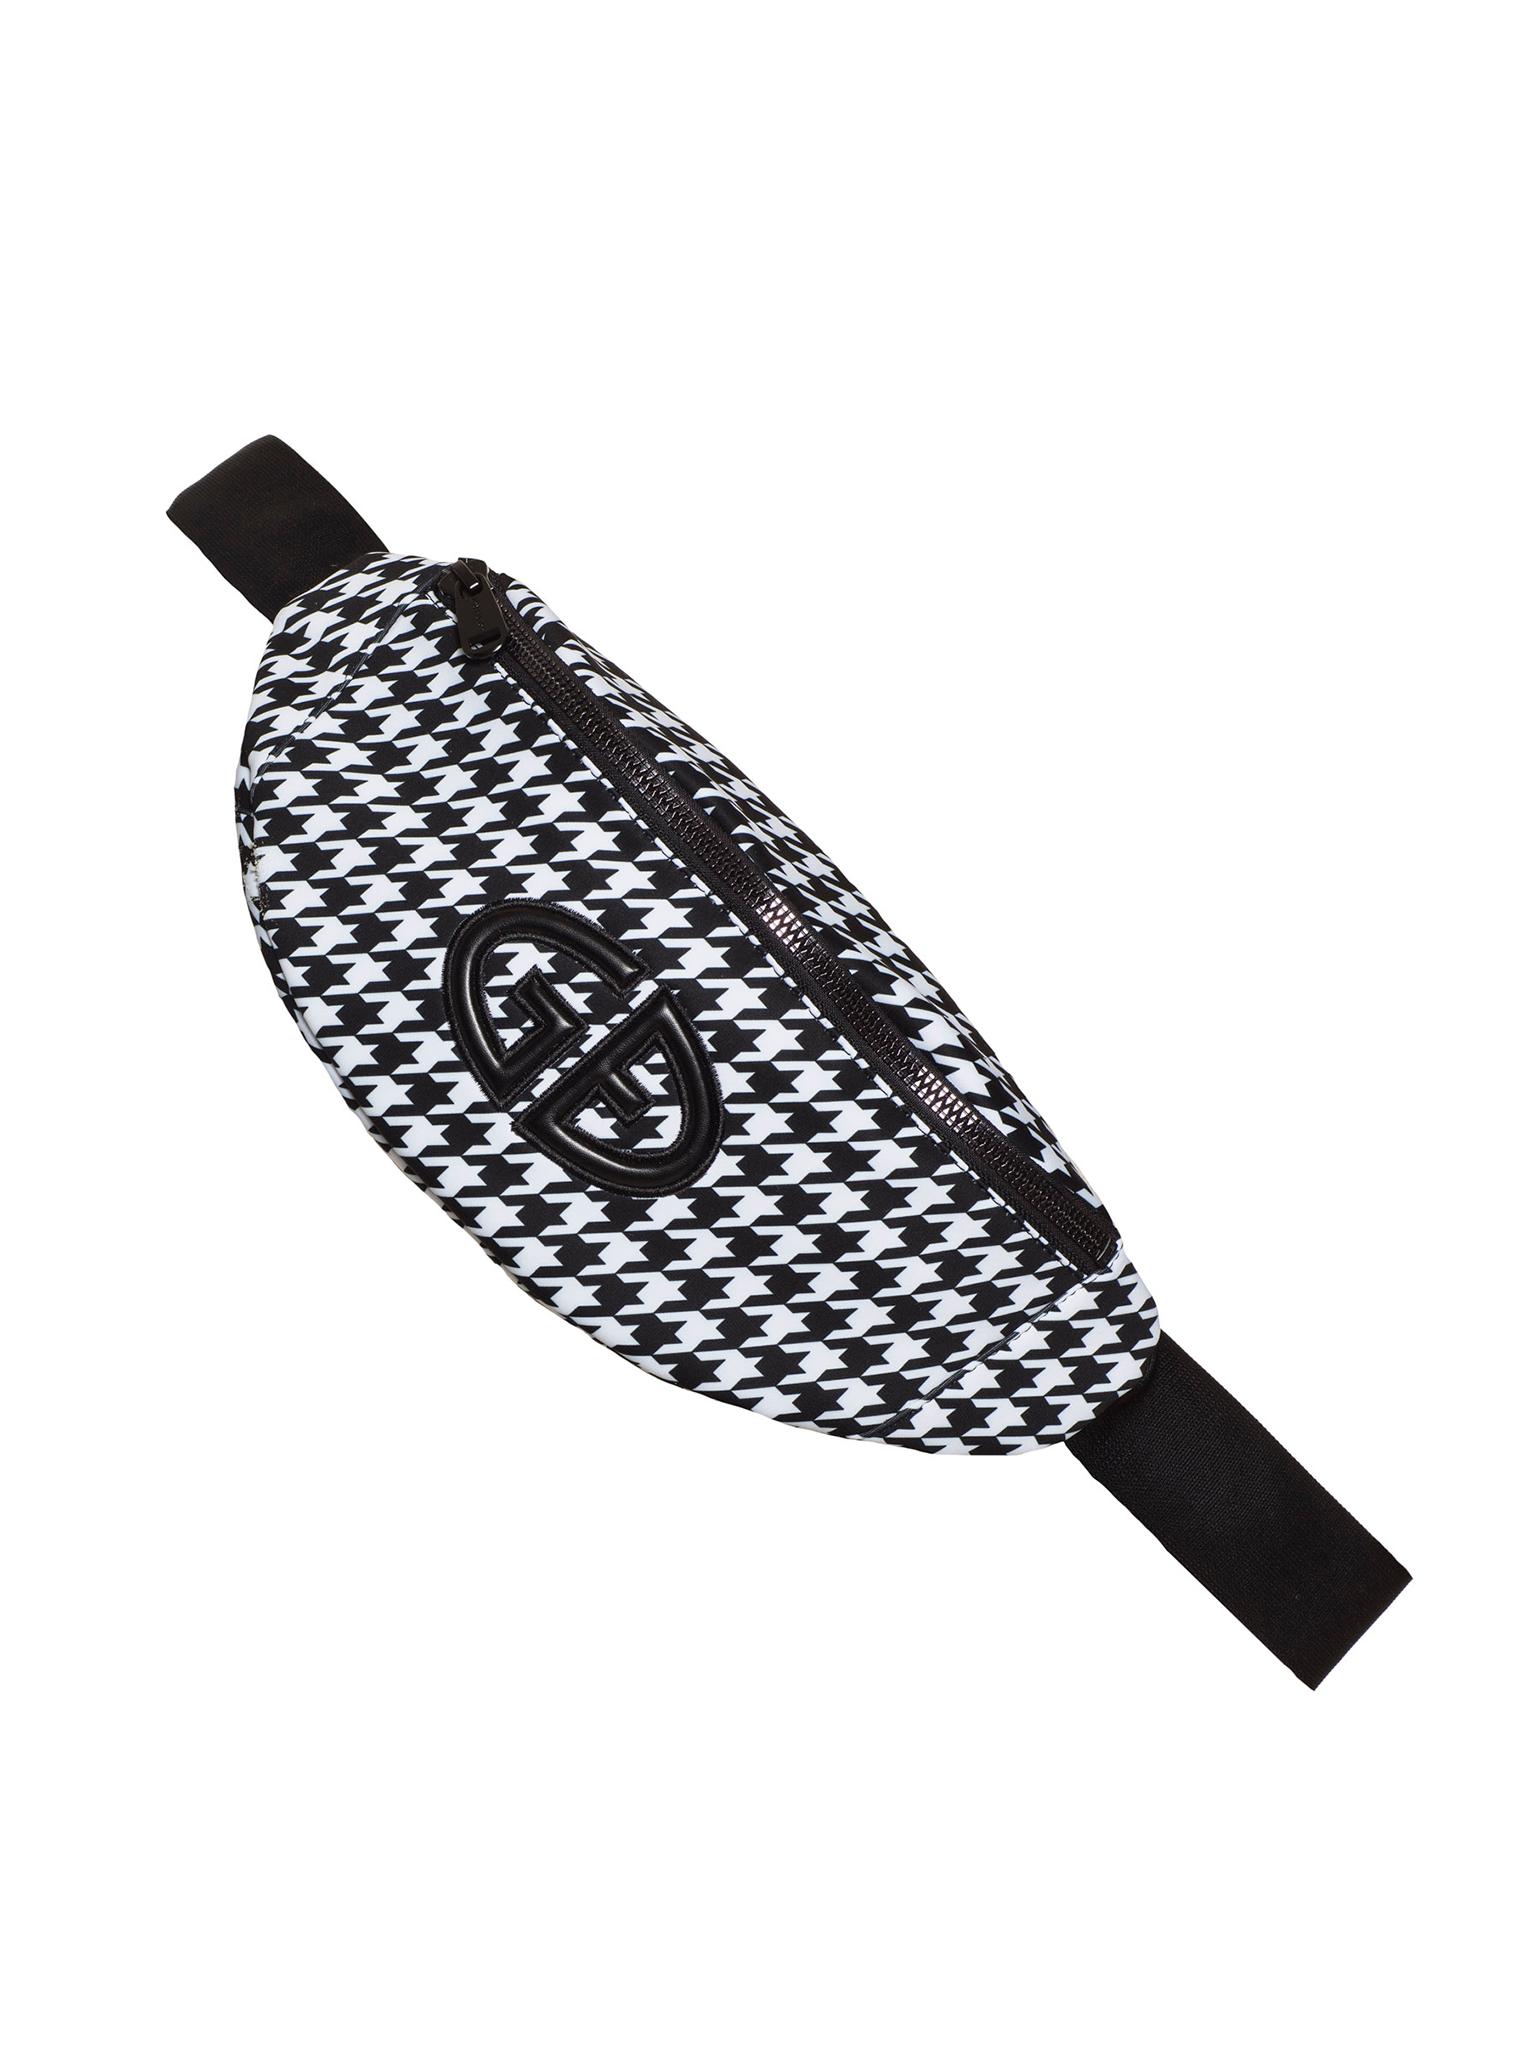 Velia Leopard Print Belt Bag from Goldbergh